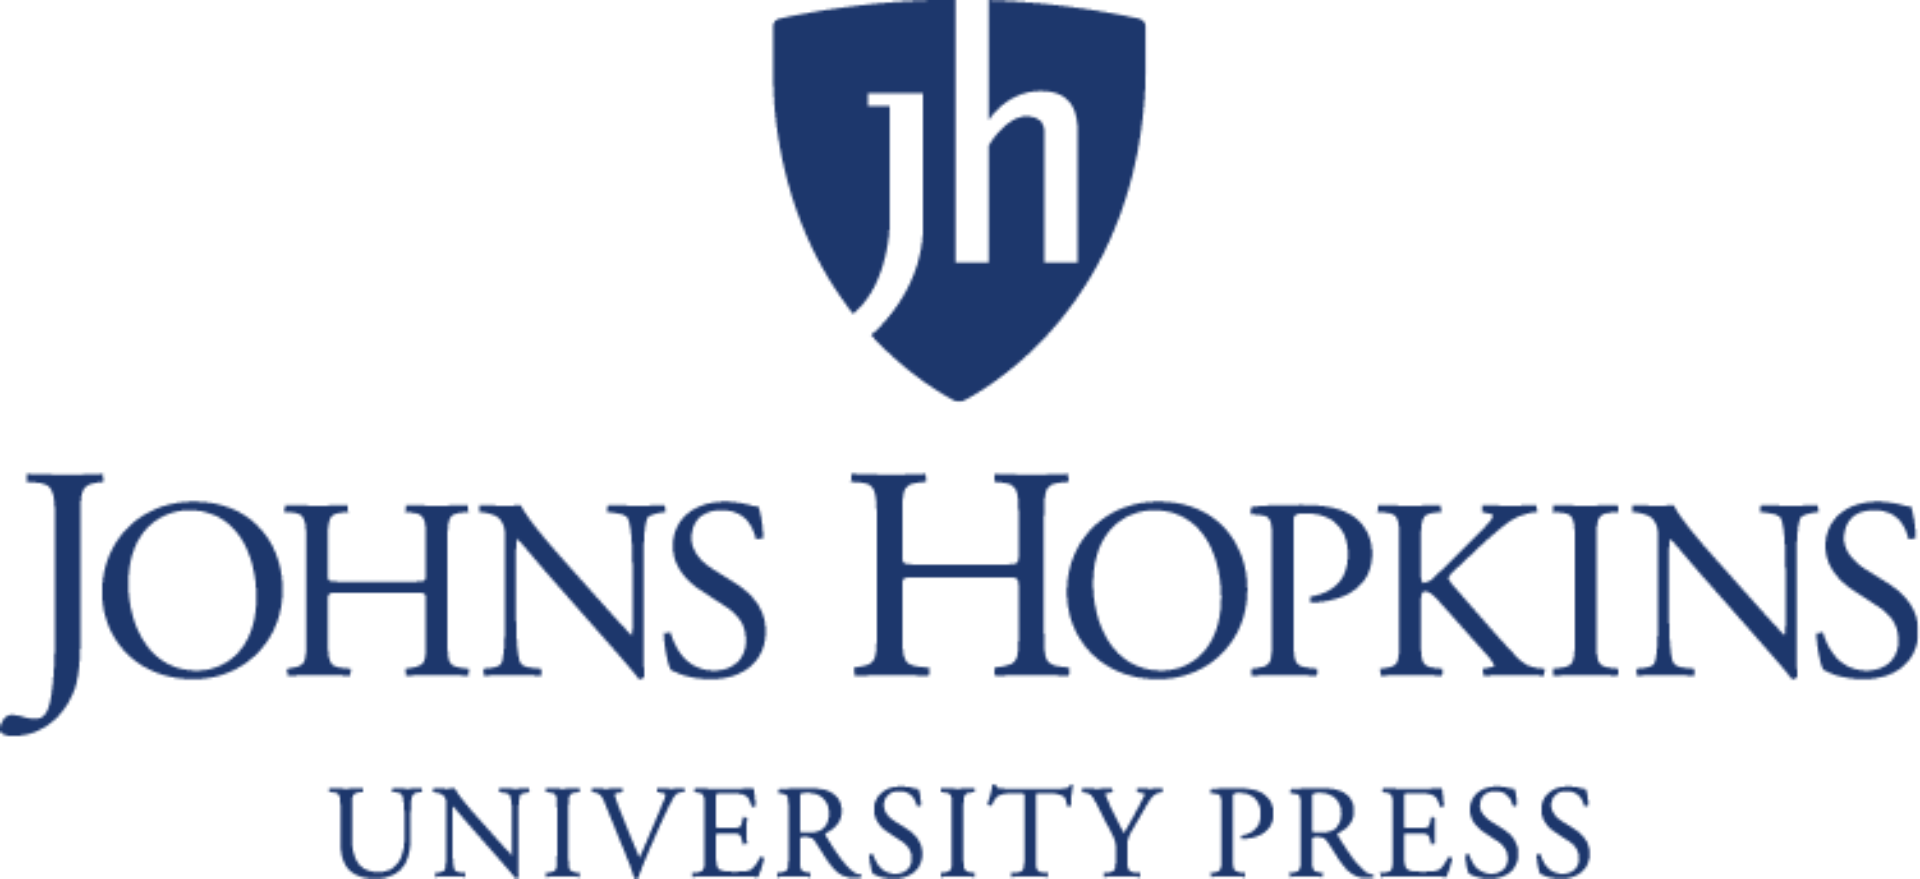 https://theconversation.com/us/topics/johns-hopkins-university-press-53832